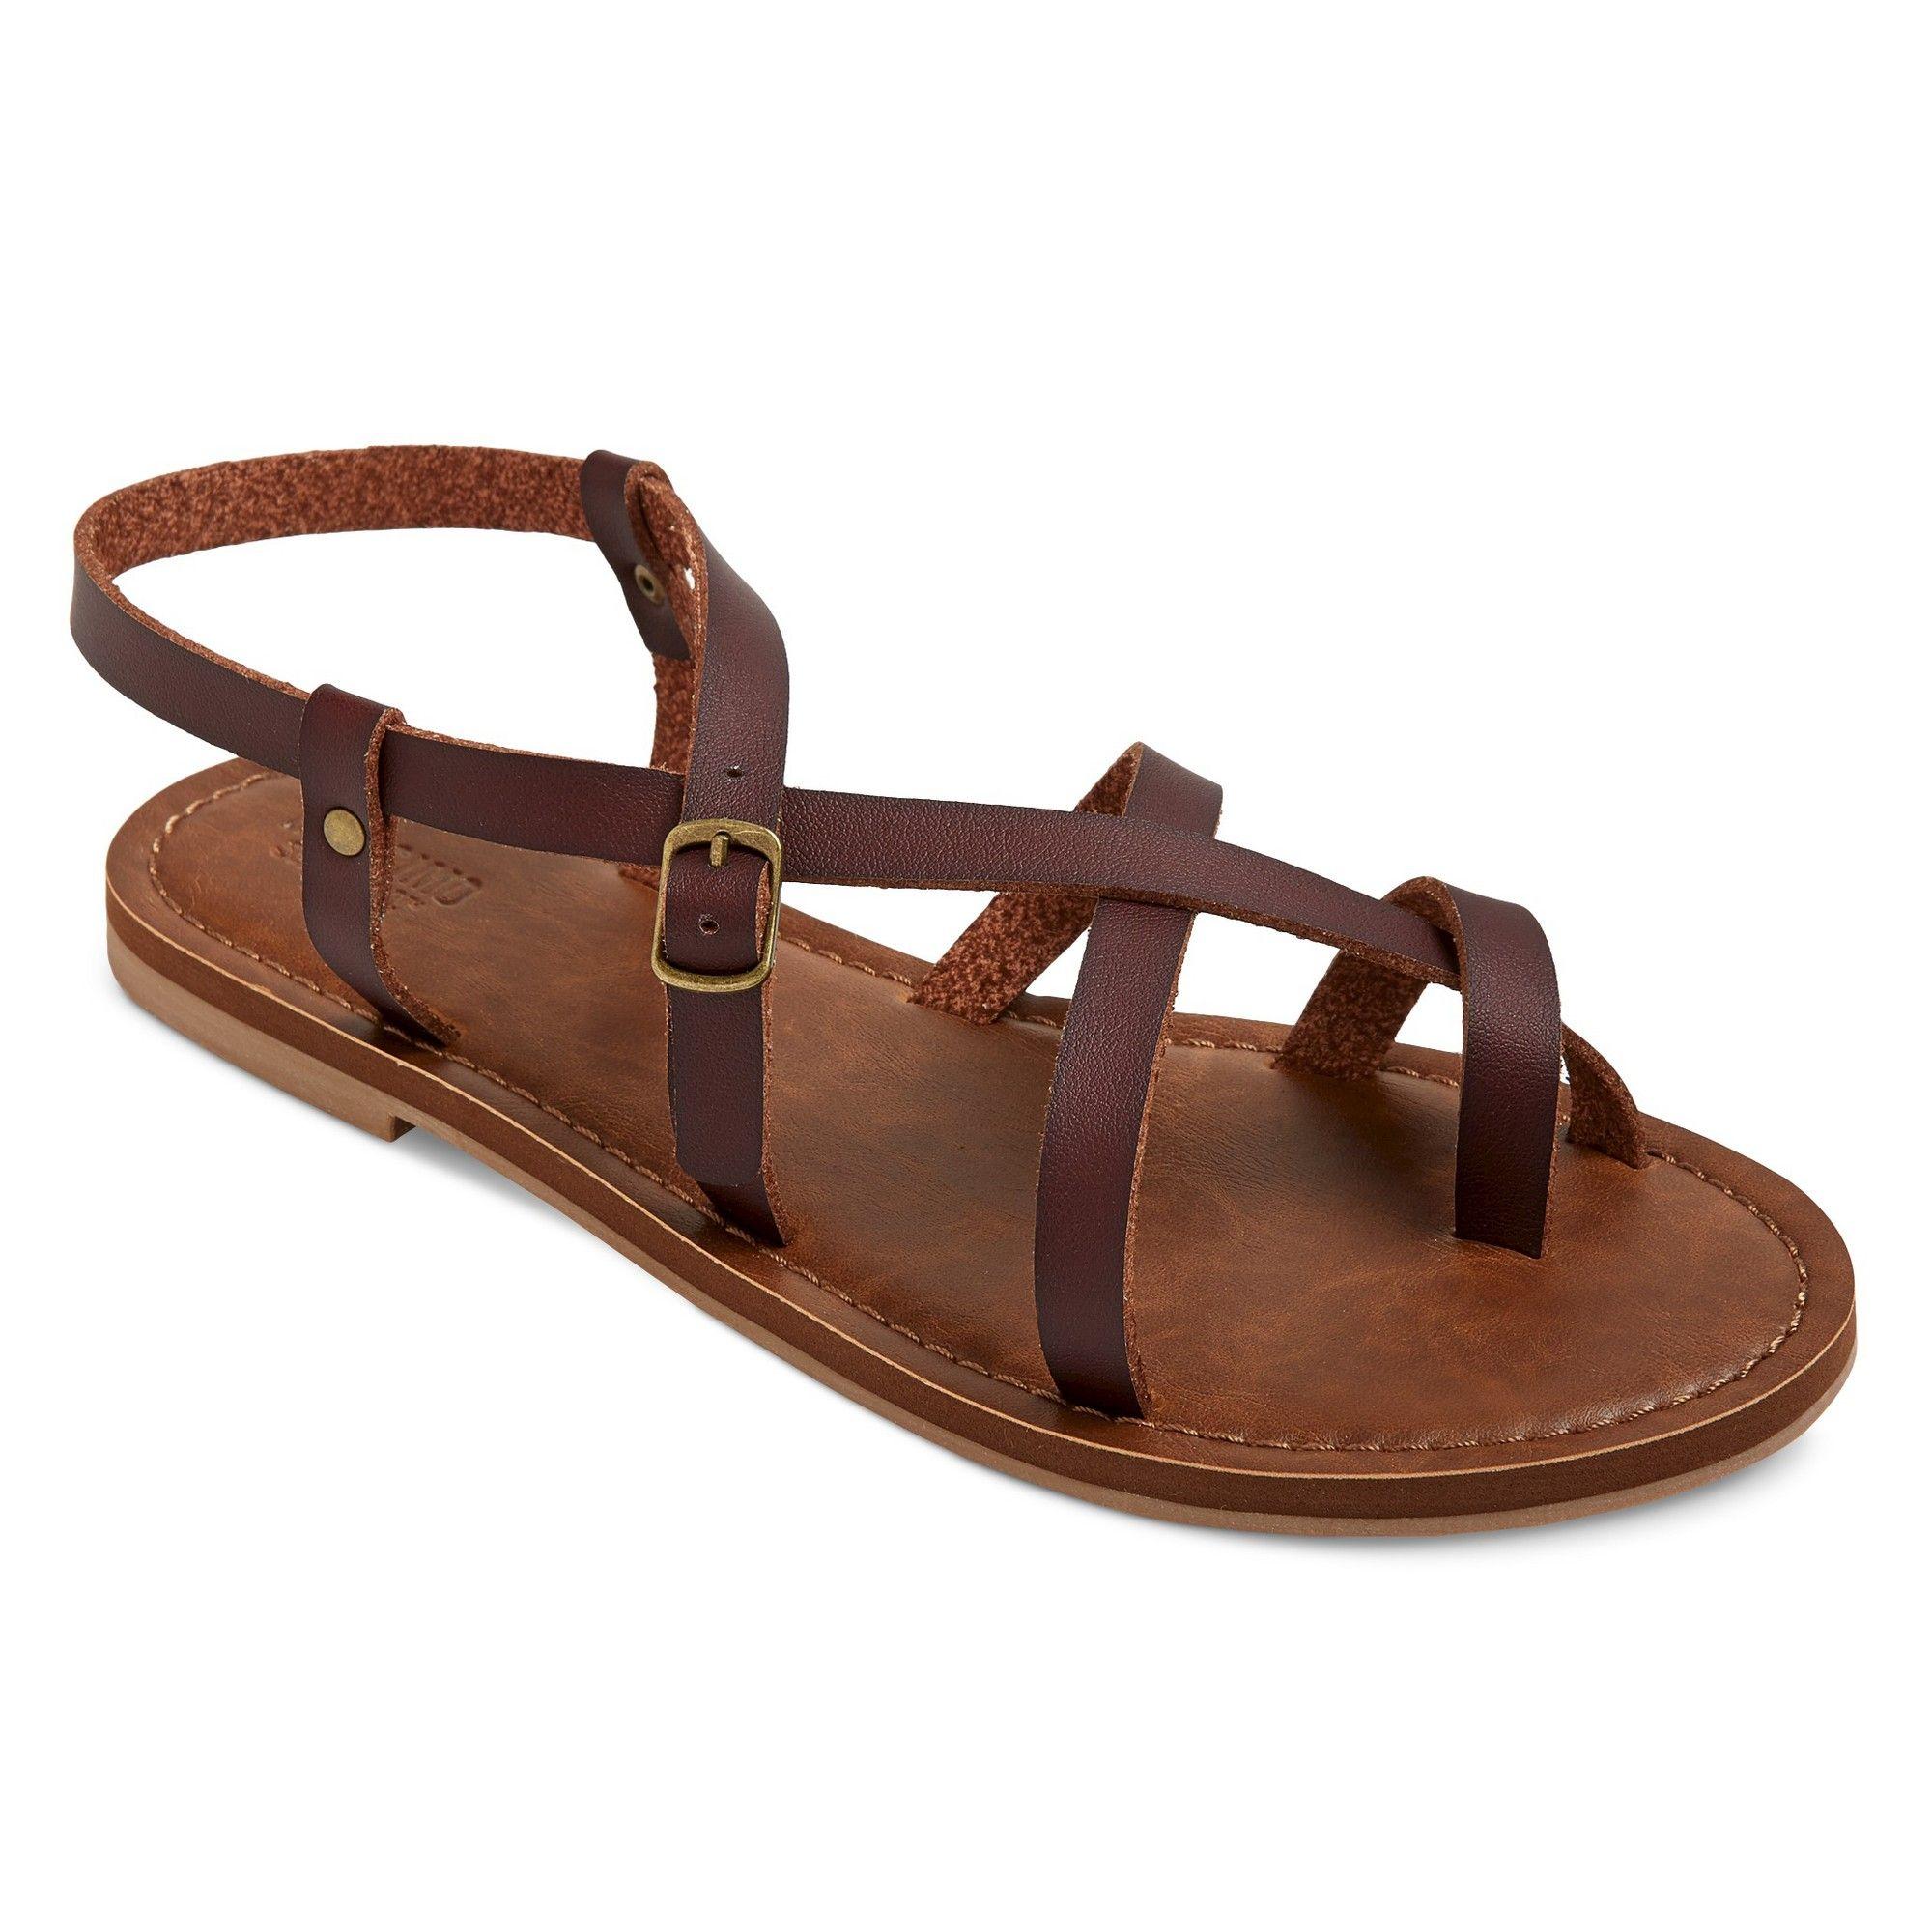 d2da81b5048f Women s Wide Width Lavinia Thong Sandals - Mossimo Supply Co. Brown 7.5W